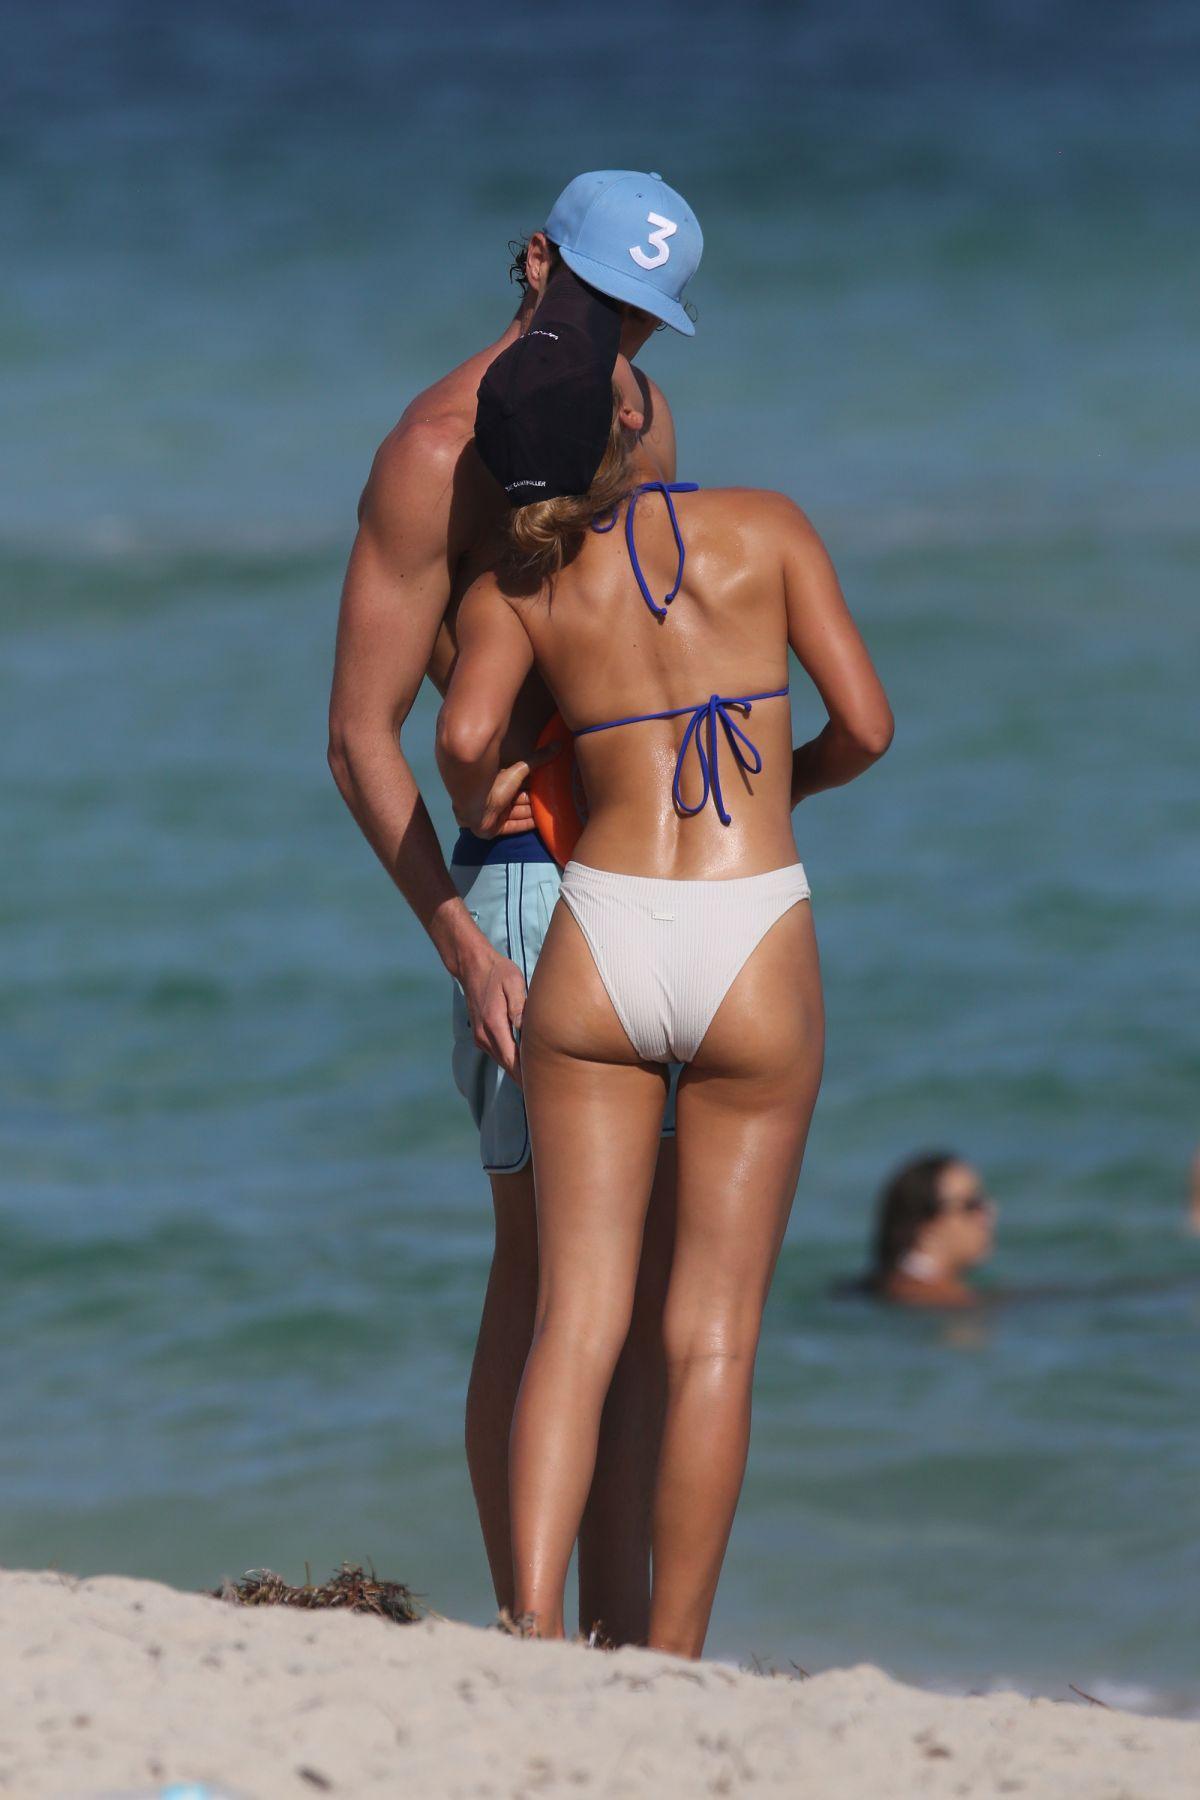 Chase Carter in Bikini at the beach in Miami Pic 9 of 35